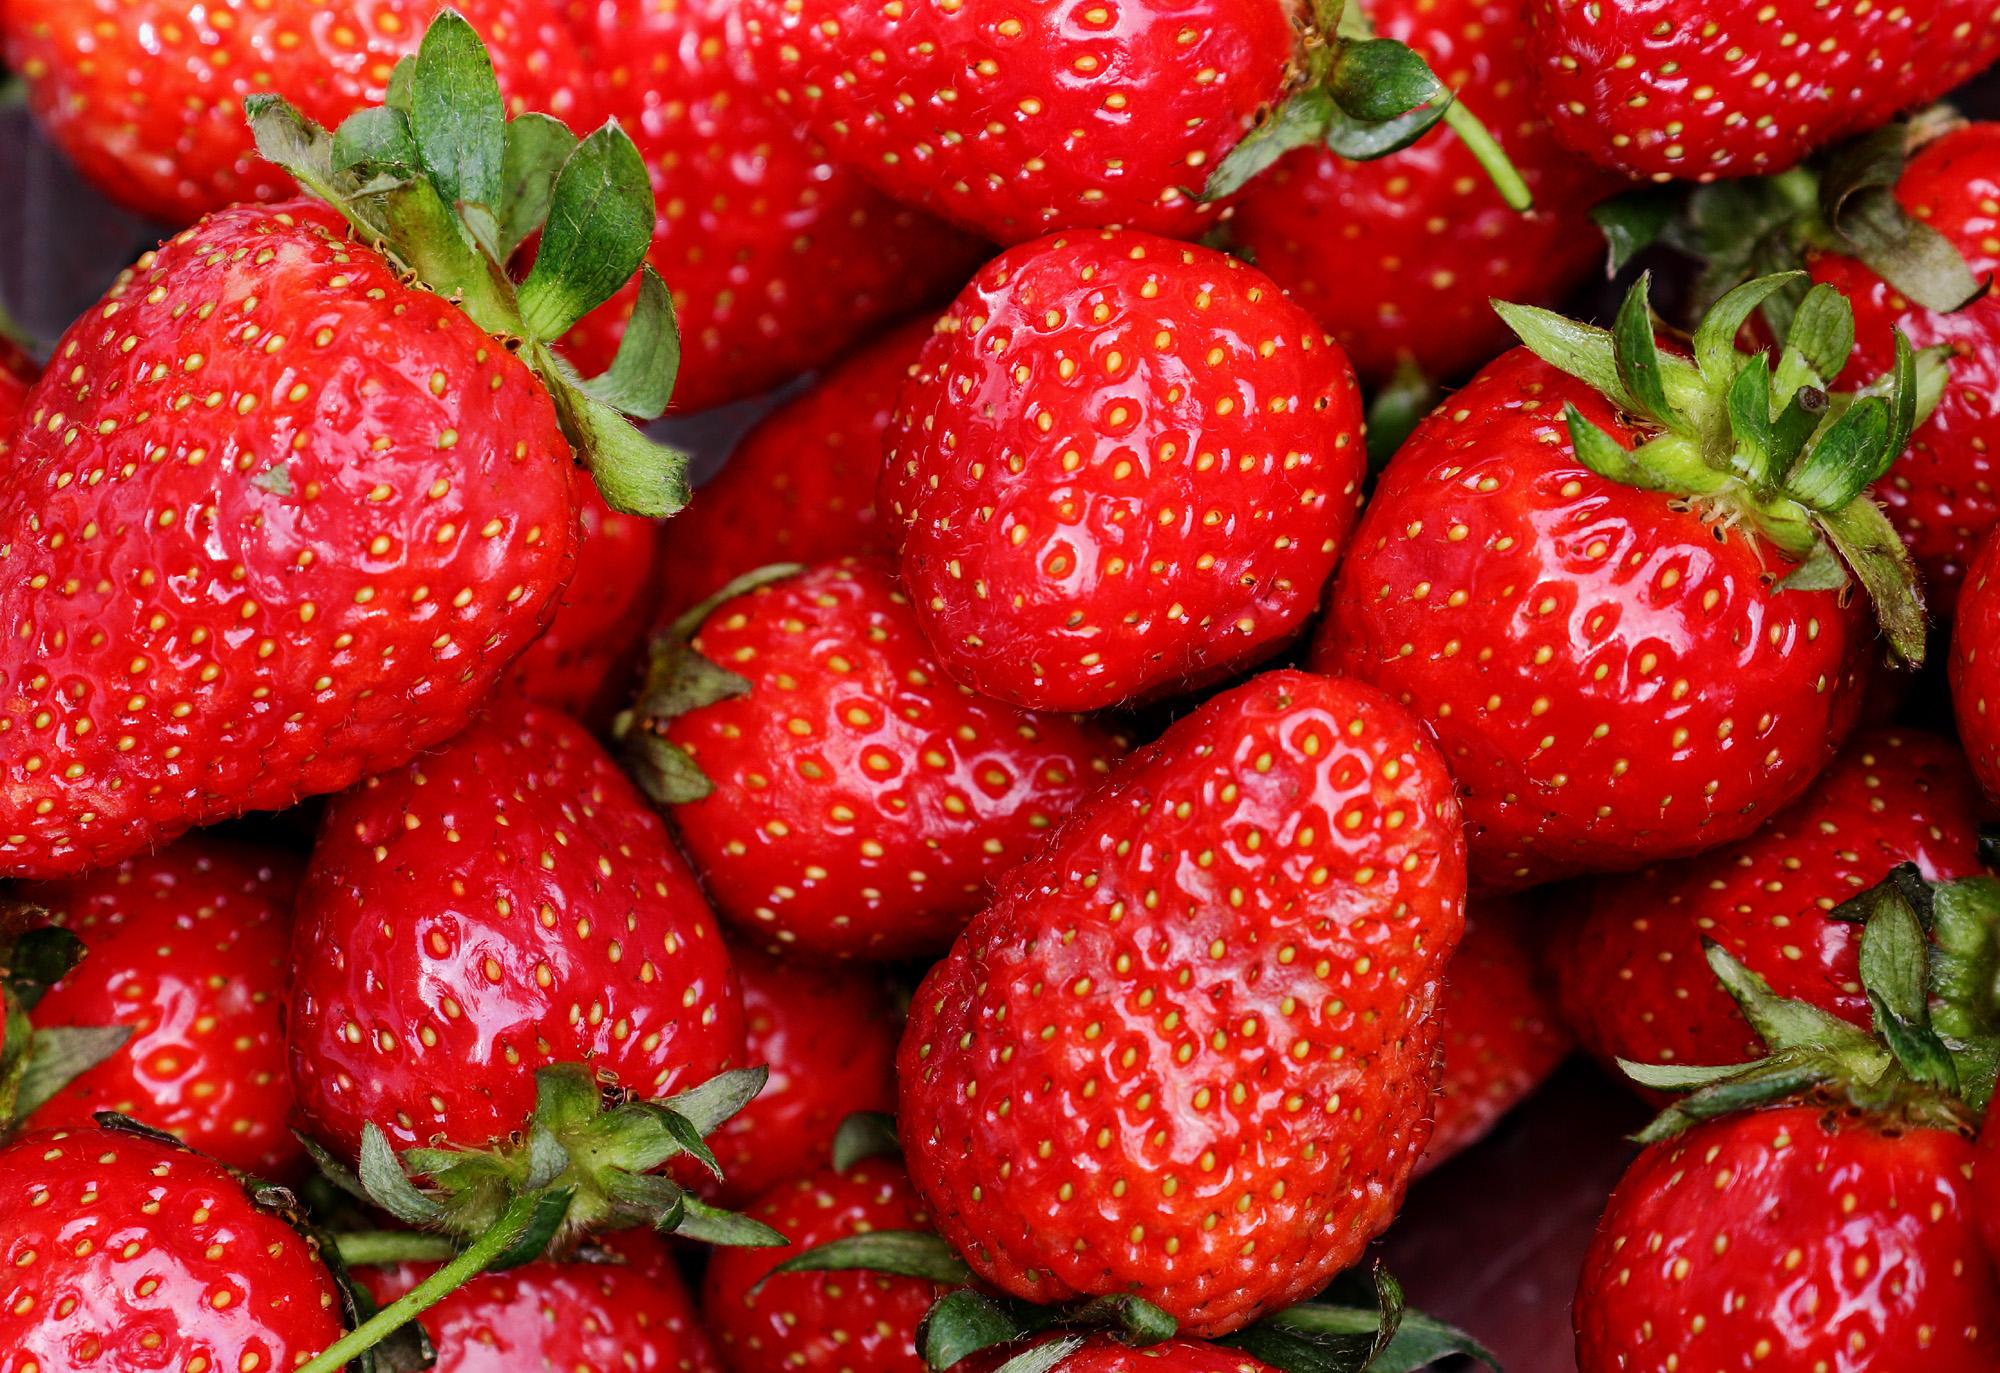 Wallpaper : food, red, plants, fruit, Frankfurt, green, strawberries ...